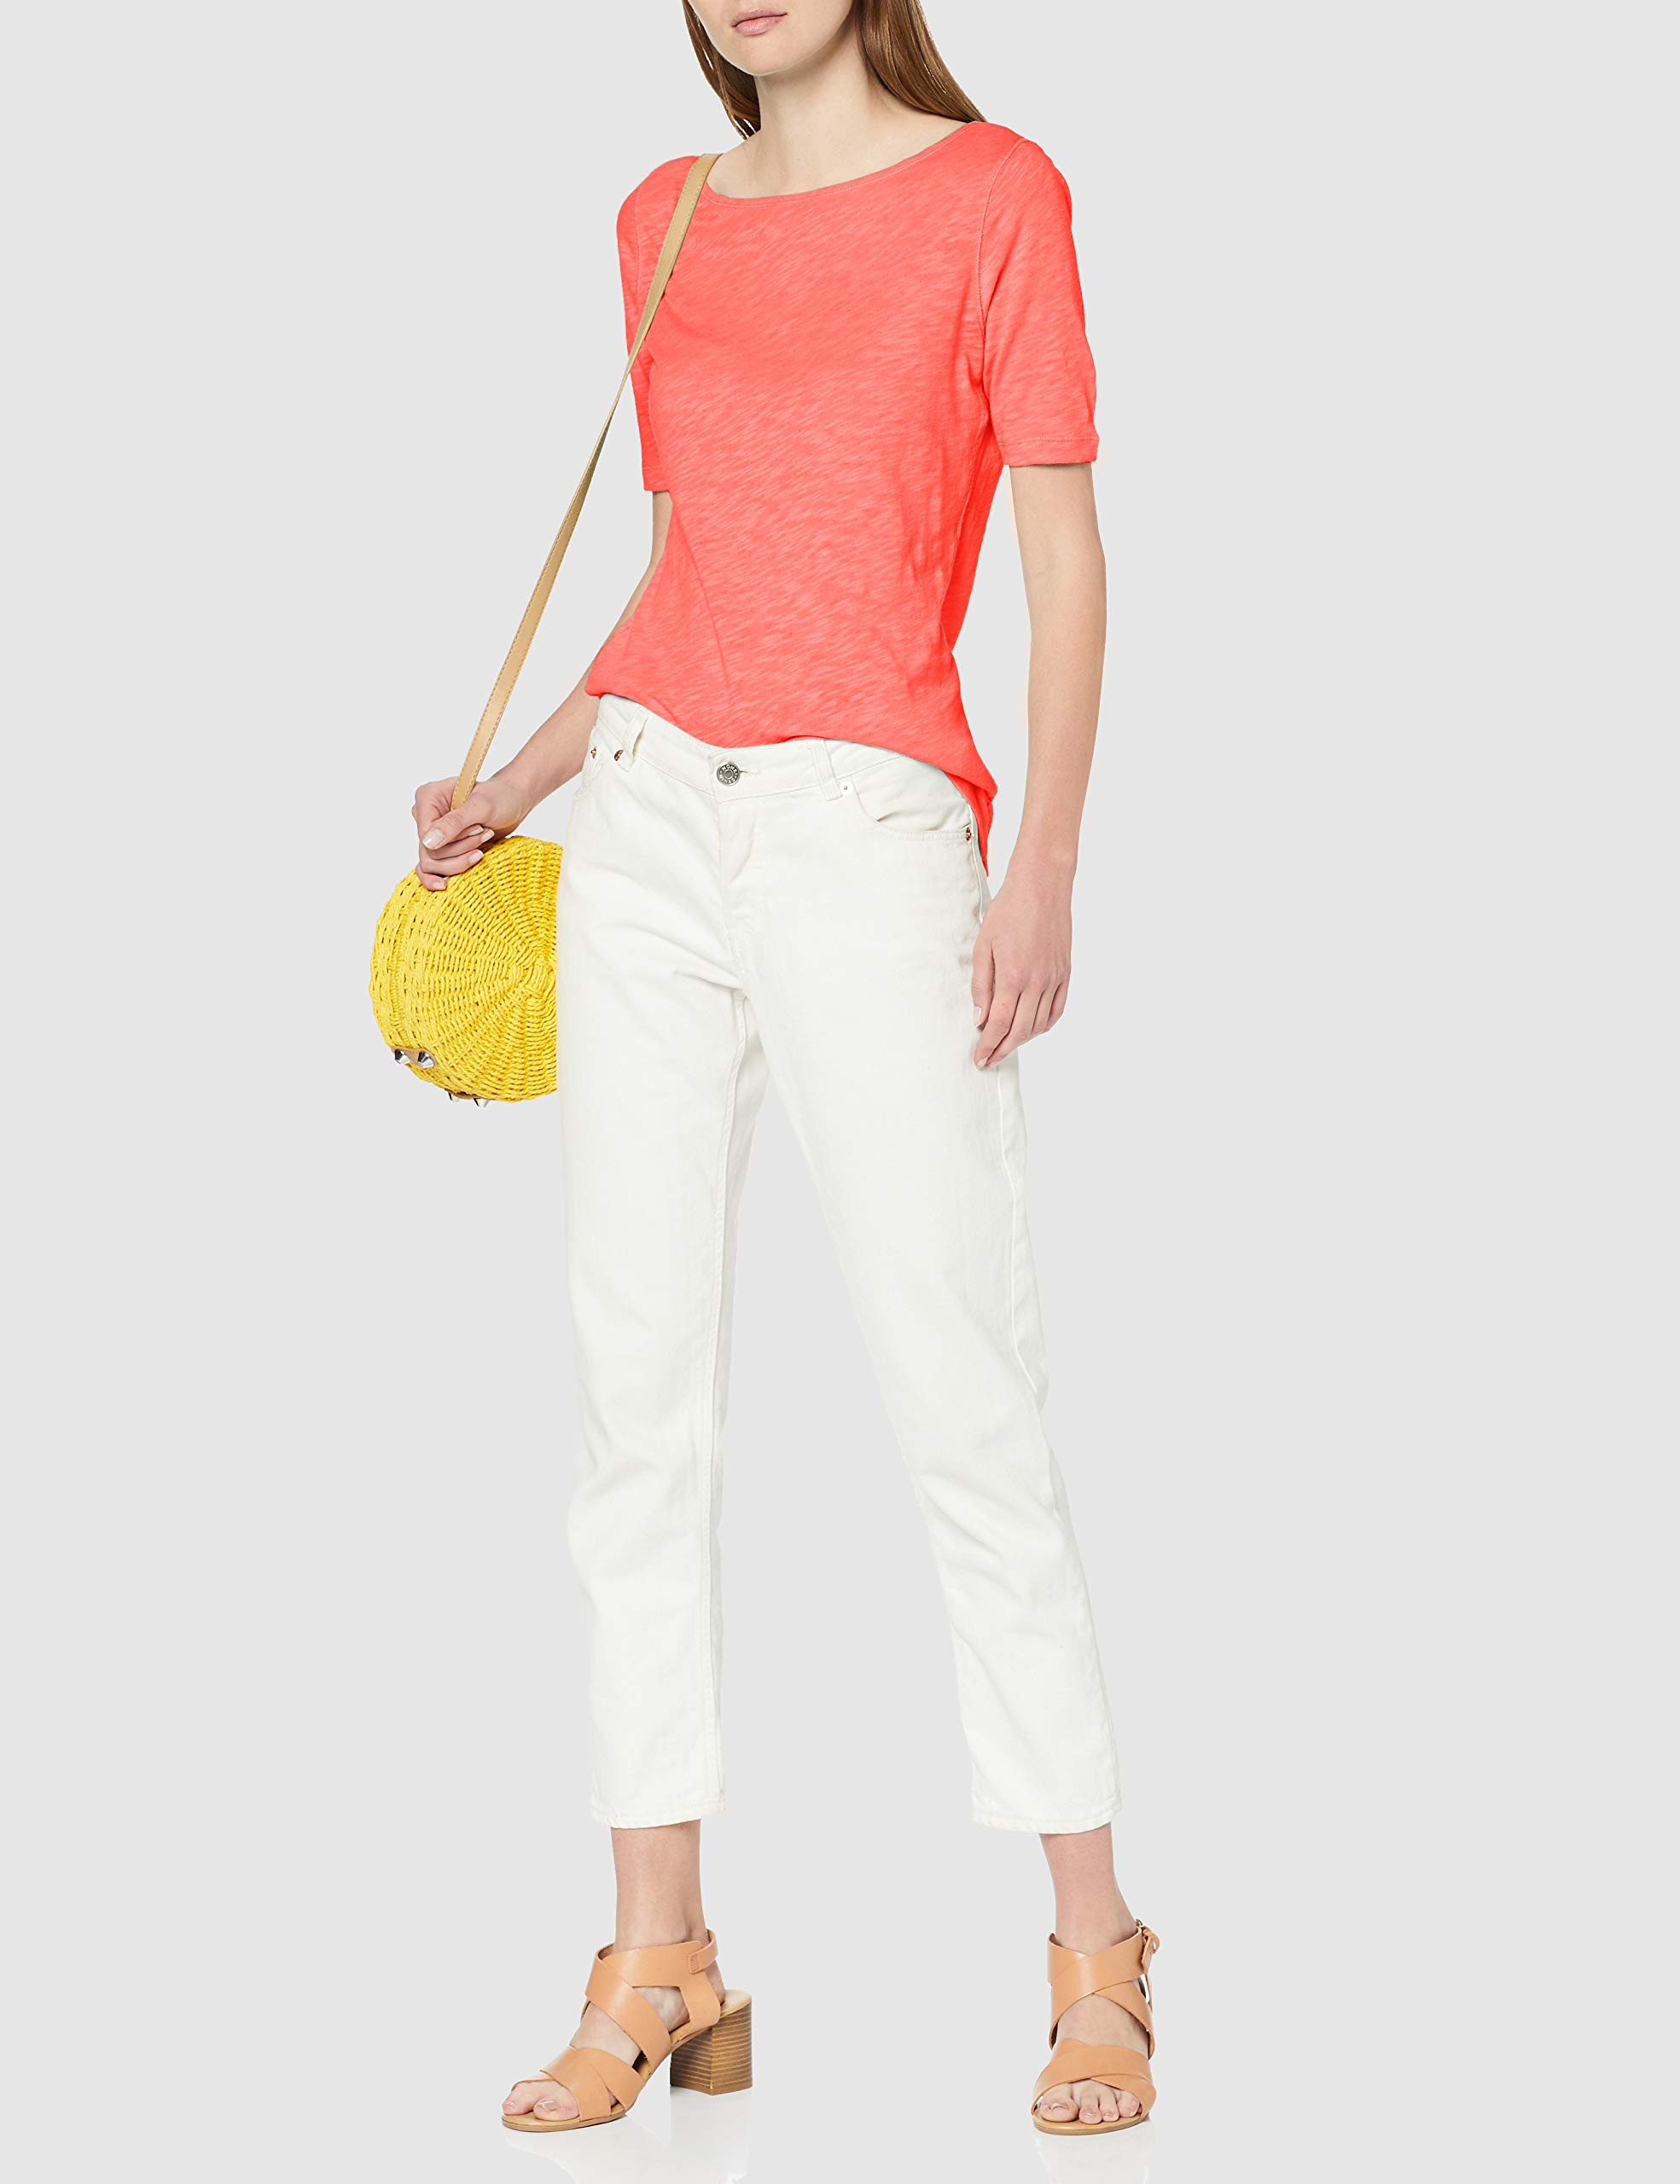 Marc O'Polo T-Shirts in pink günstig kaufen